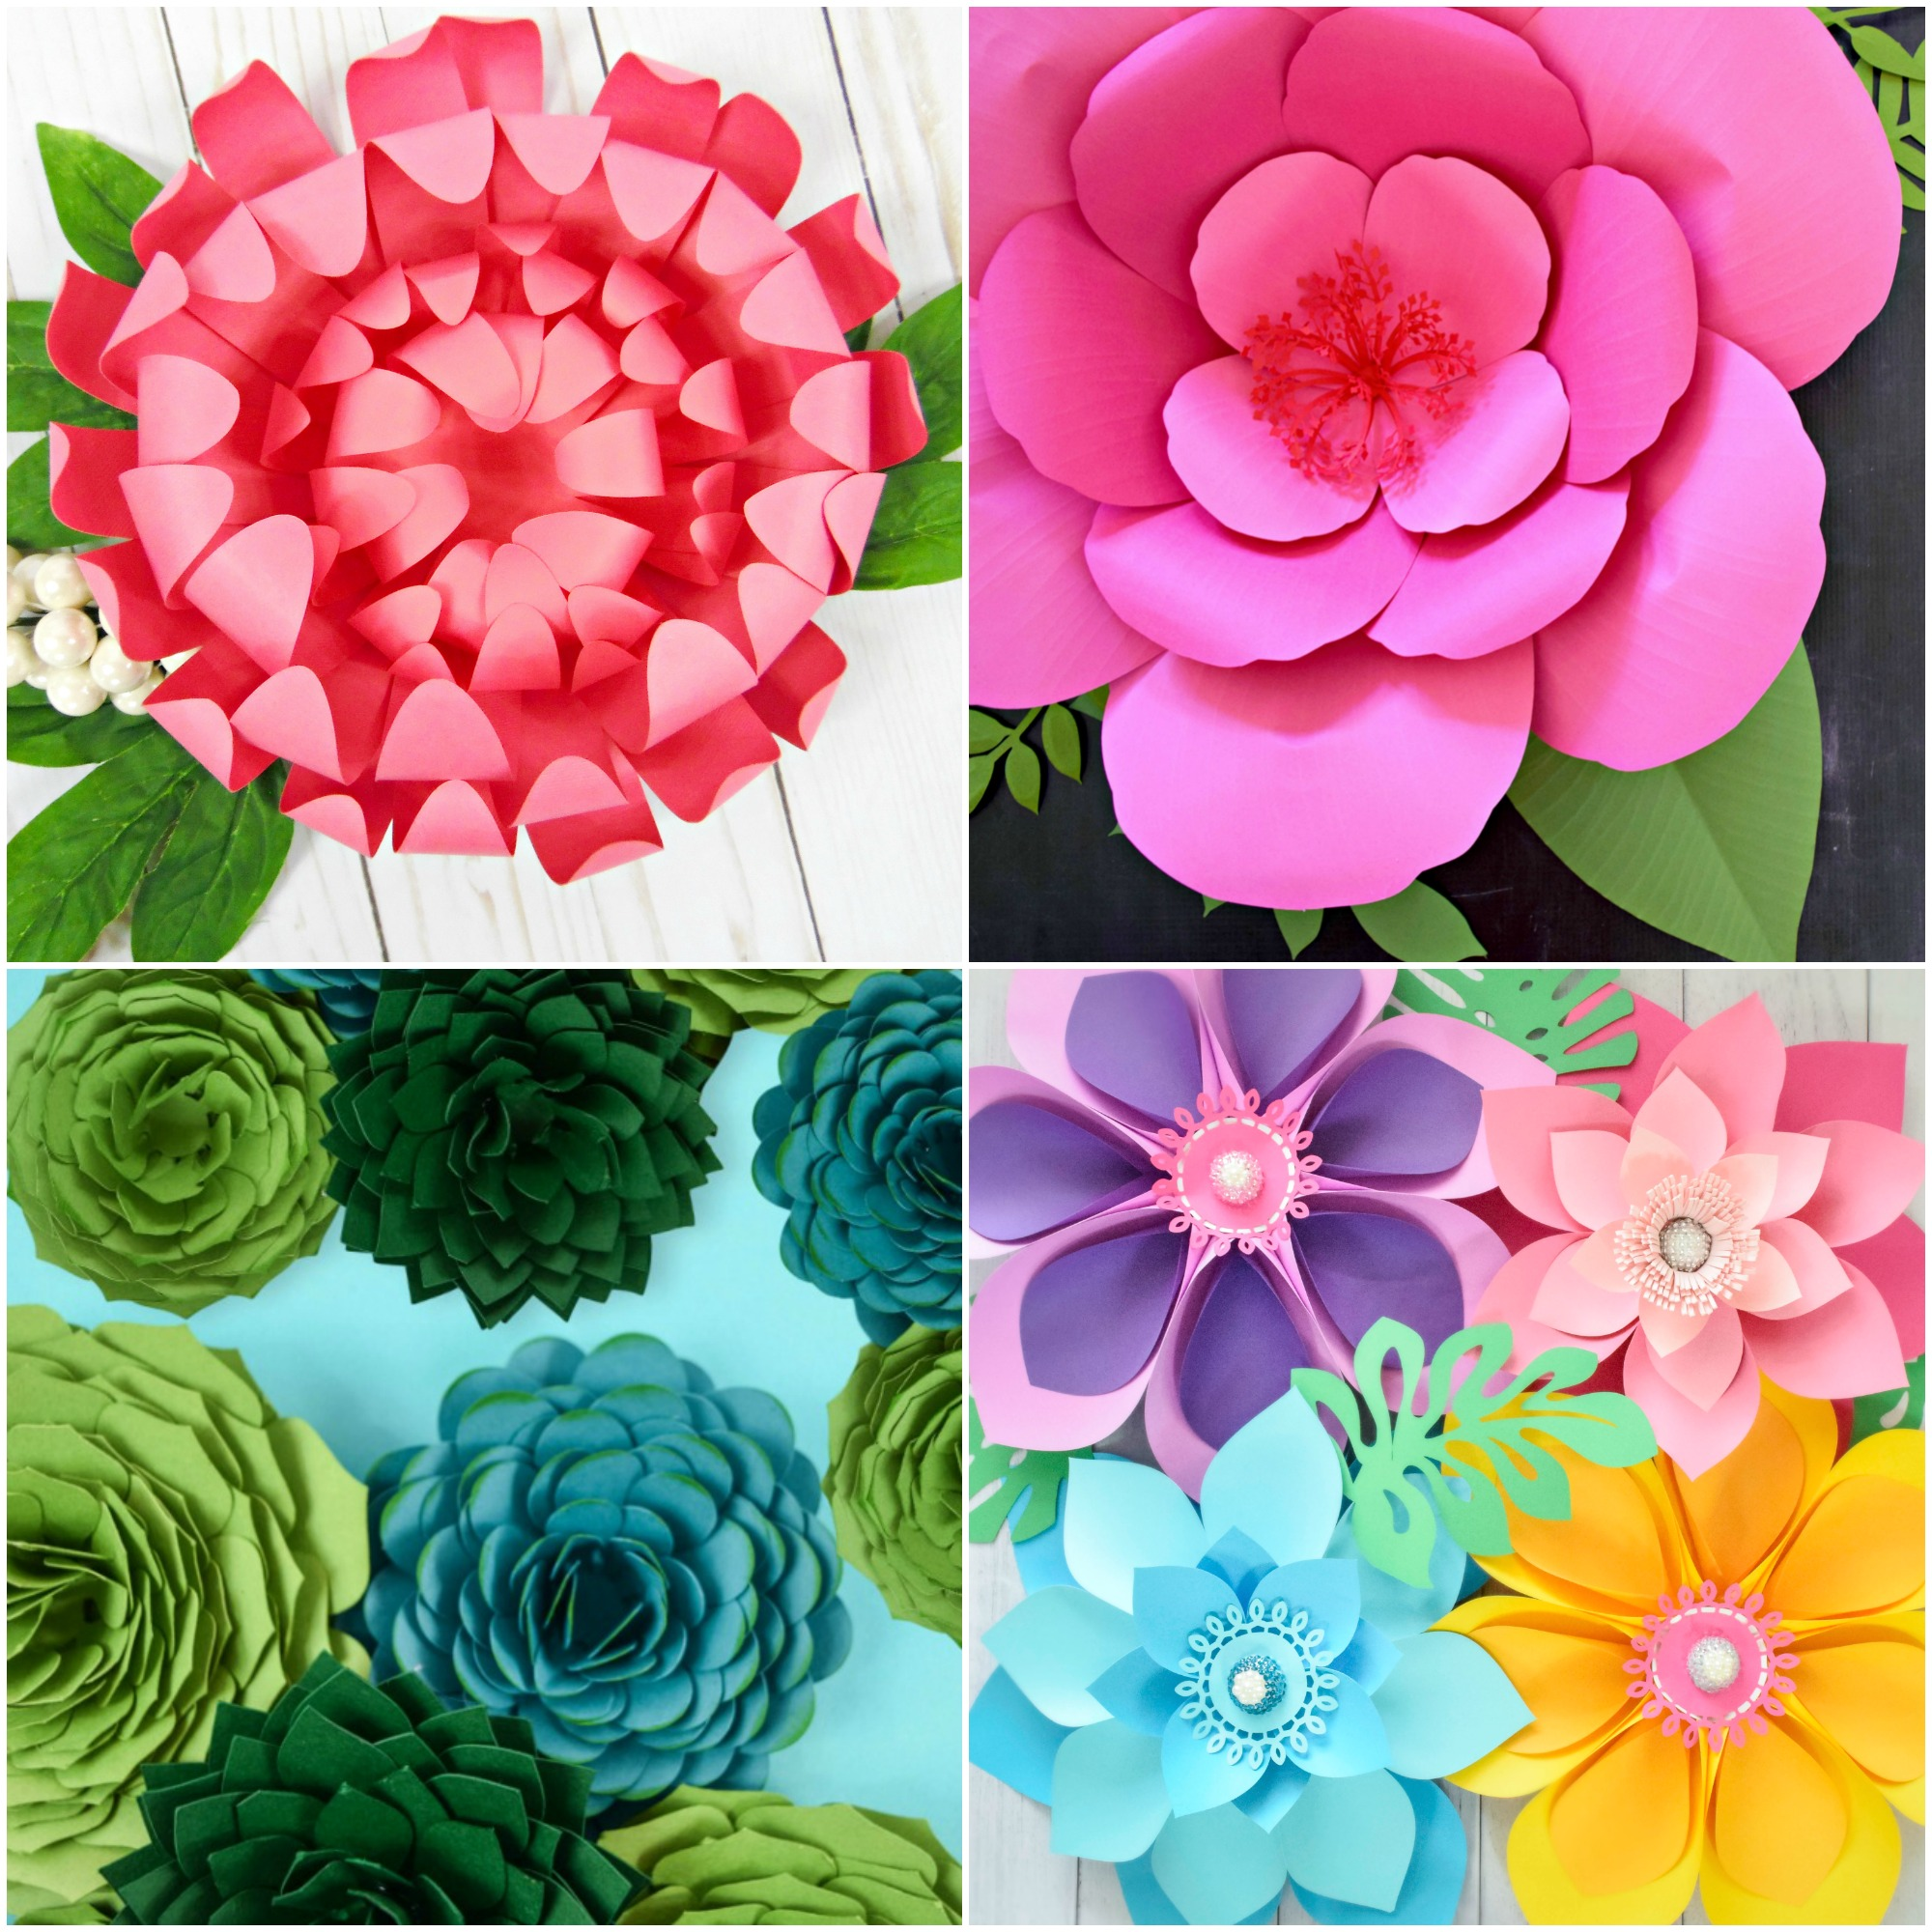 Summertime Paper Flower Roundup – The Best Paper Flower Tutorials